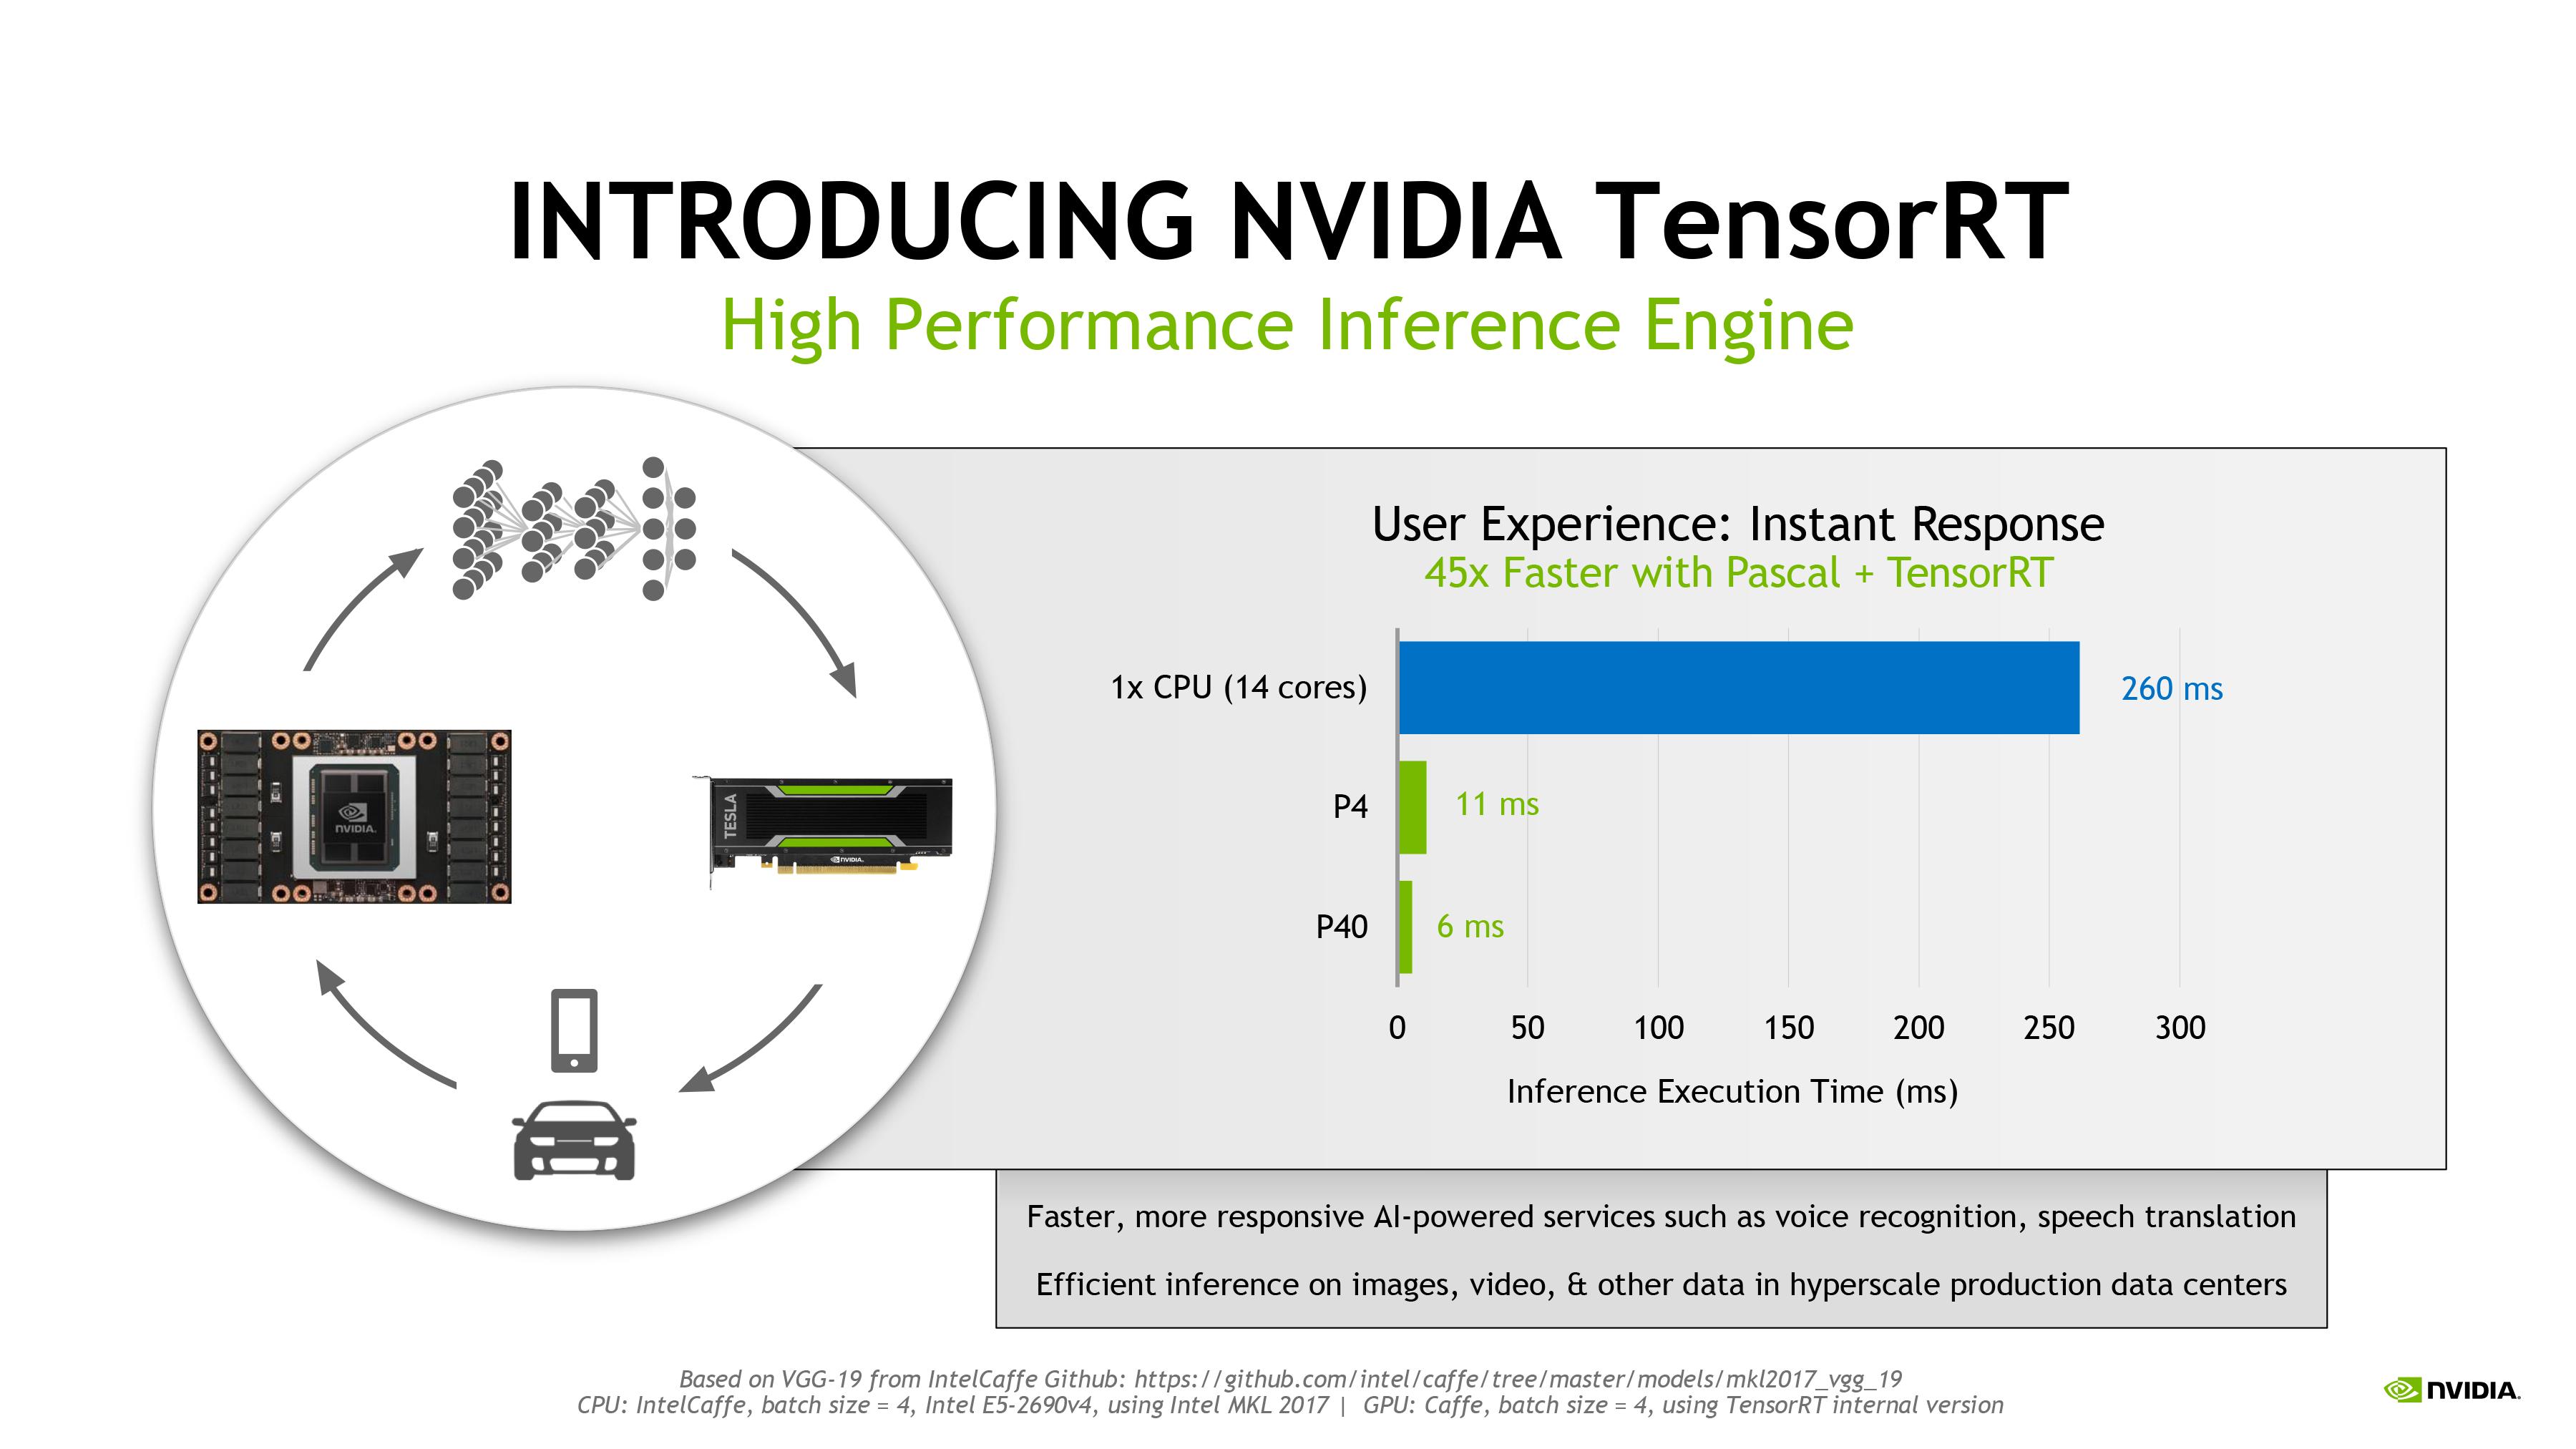 NVIDIA Announces Tesla P40 & Tesla P4 - Neural Network Inference